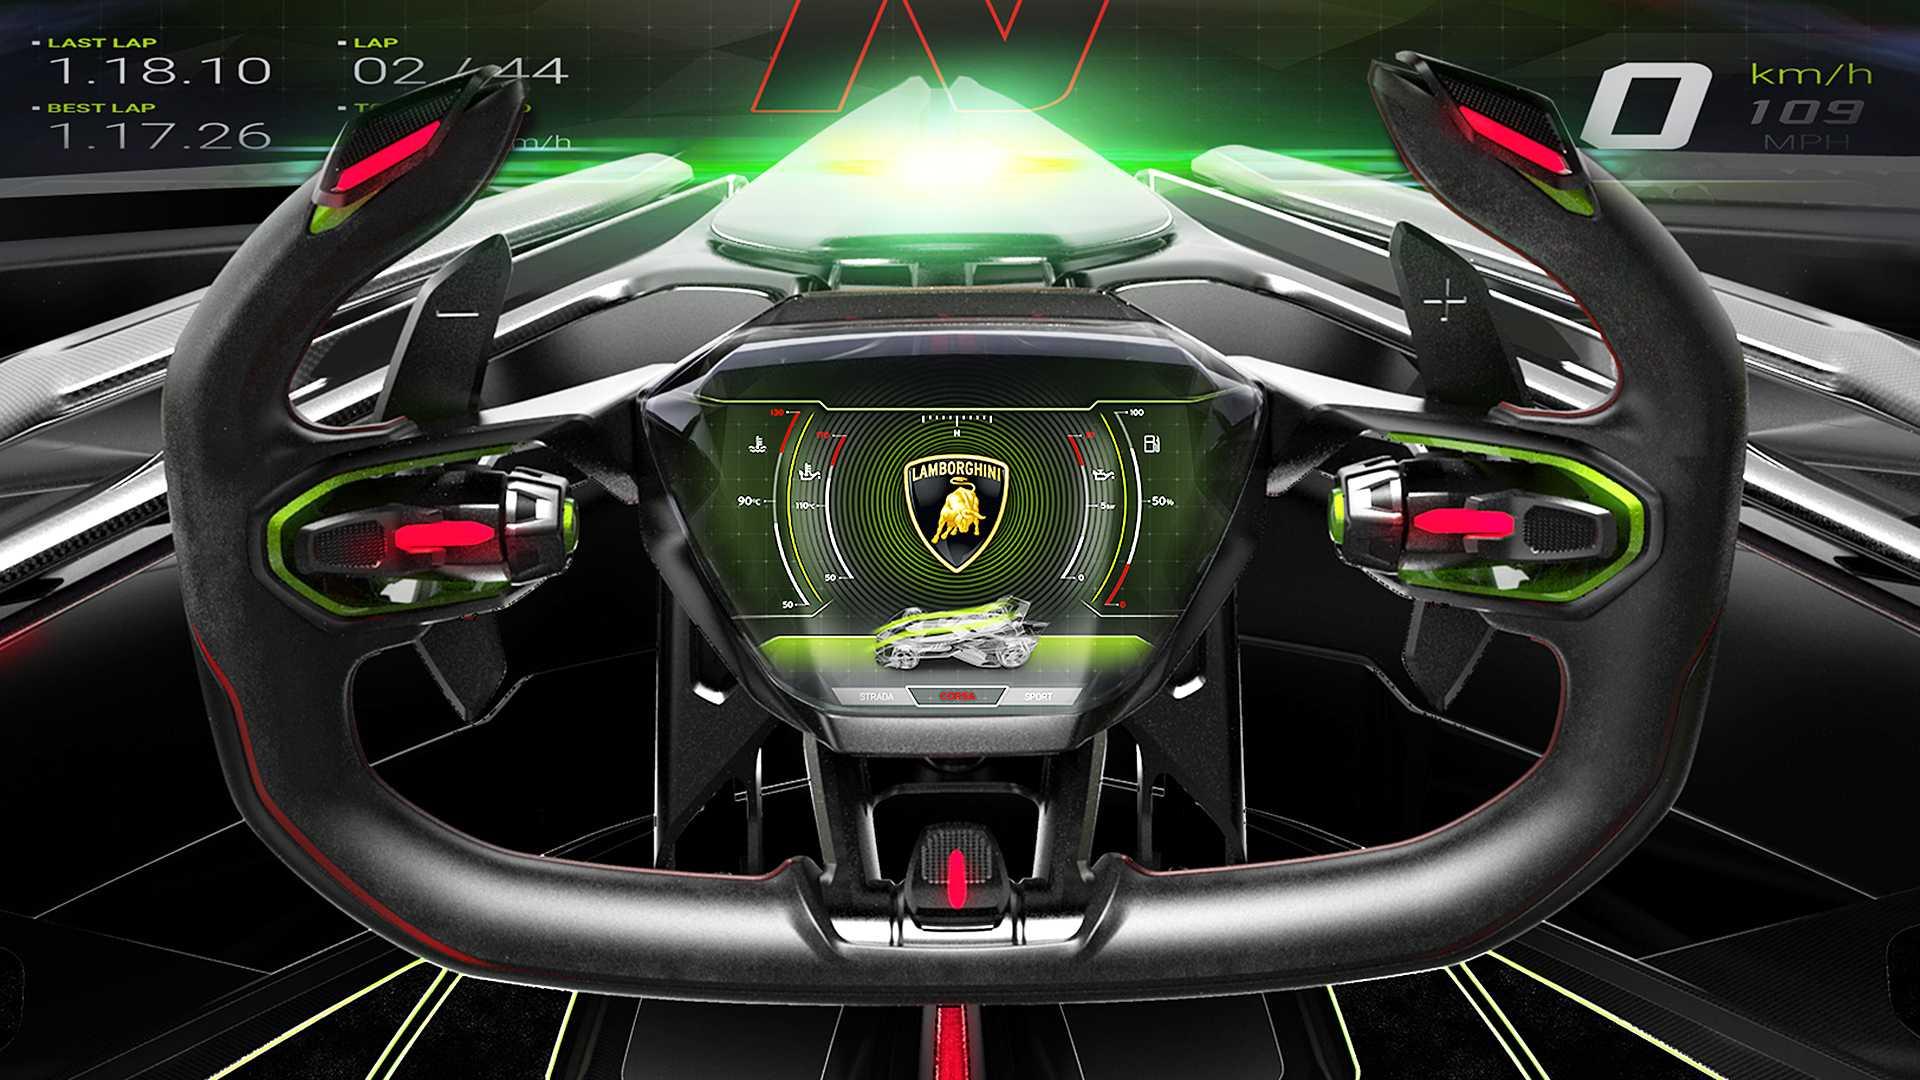 Lamborghini-V12-Vision-Gran-Turismo-4